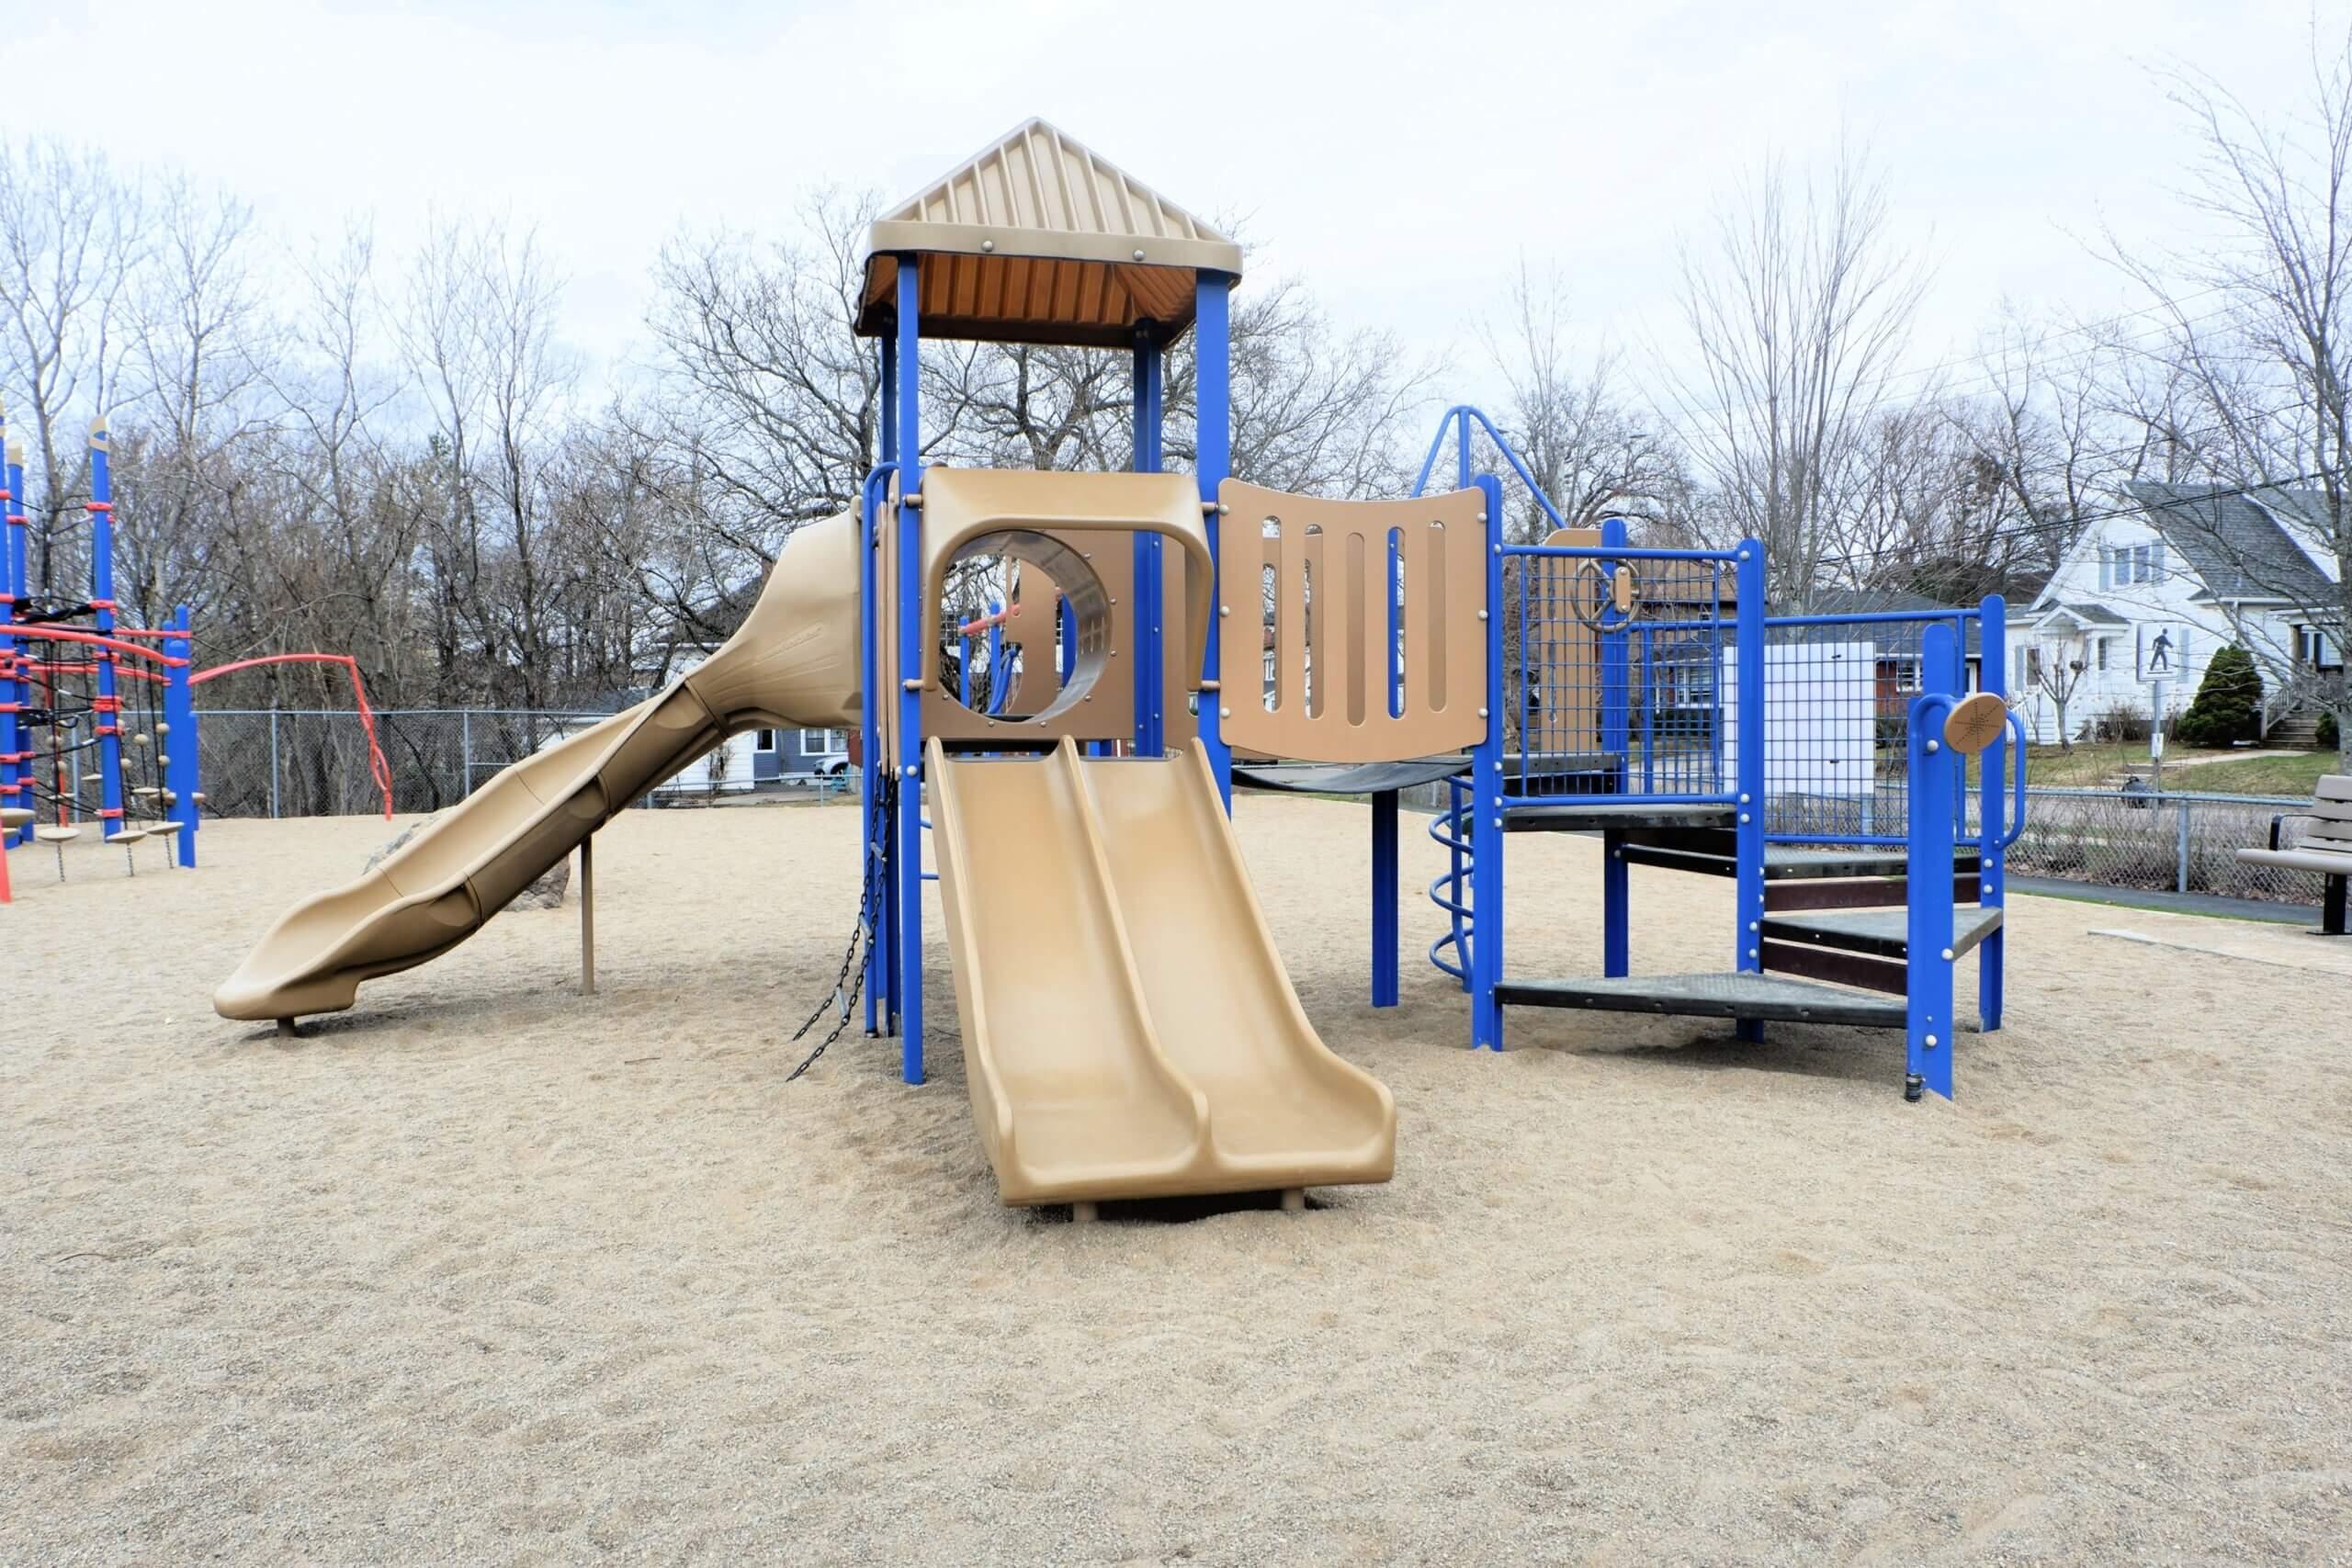 moncton hall's creek marjorie street playground park PICKLE PLANET double slide